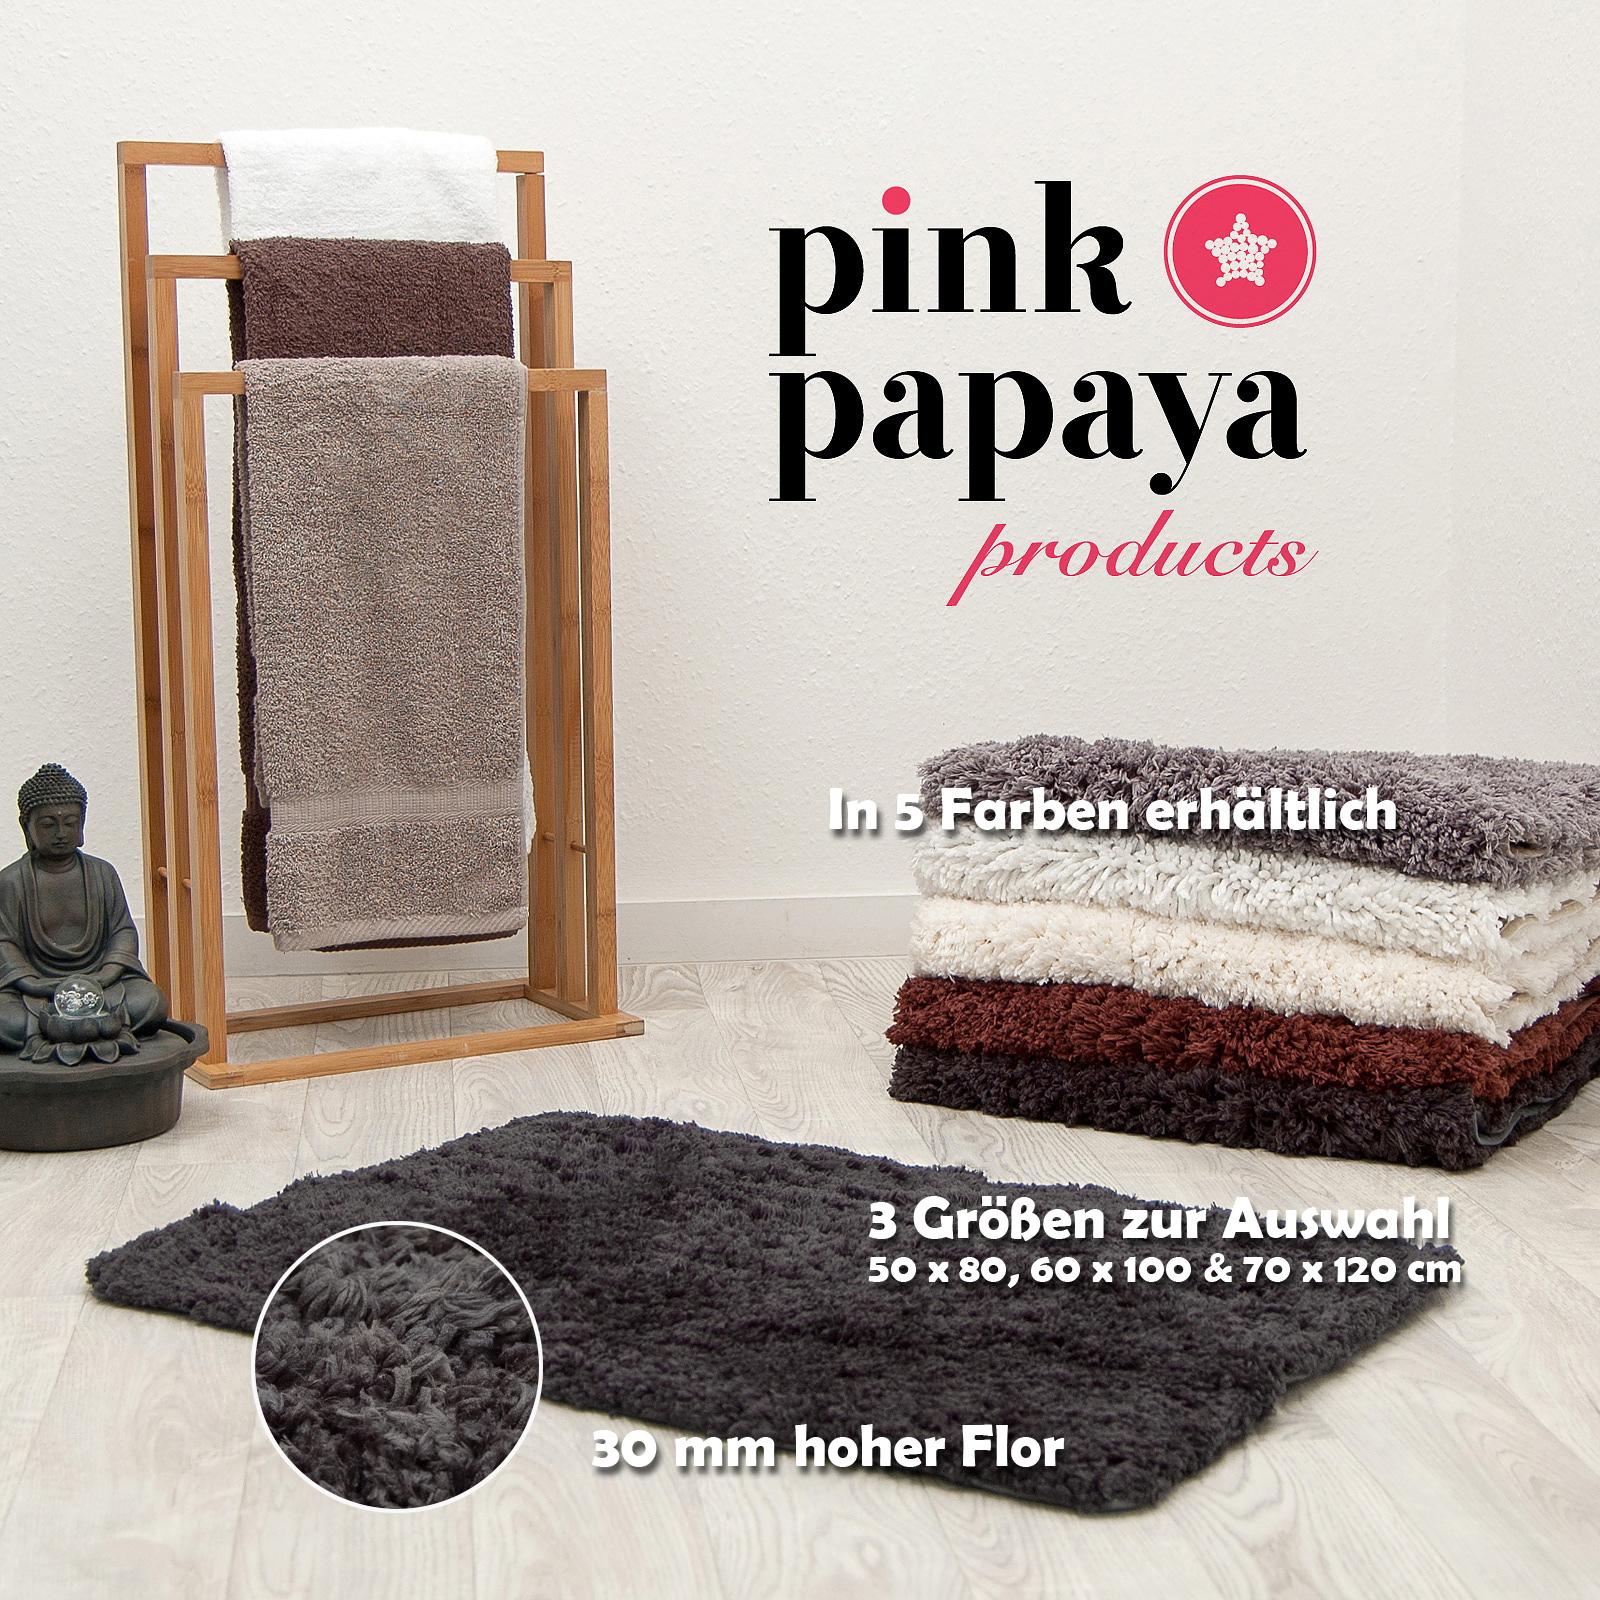 pink papaya hochflor luxus badteppich cloud 70 x 120 cm anthrazit ebay. Black Bedroom Furniture Sets. Home Design Ideas